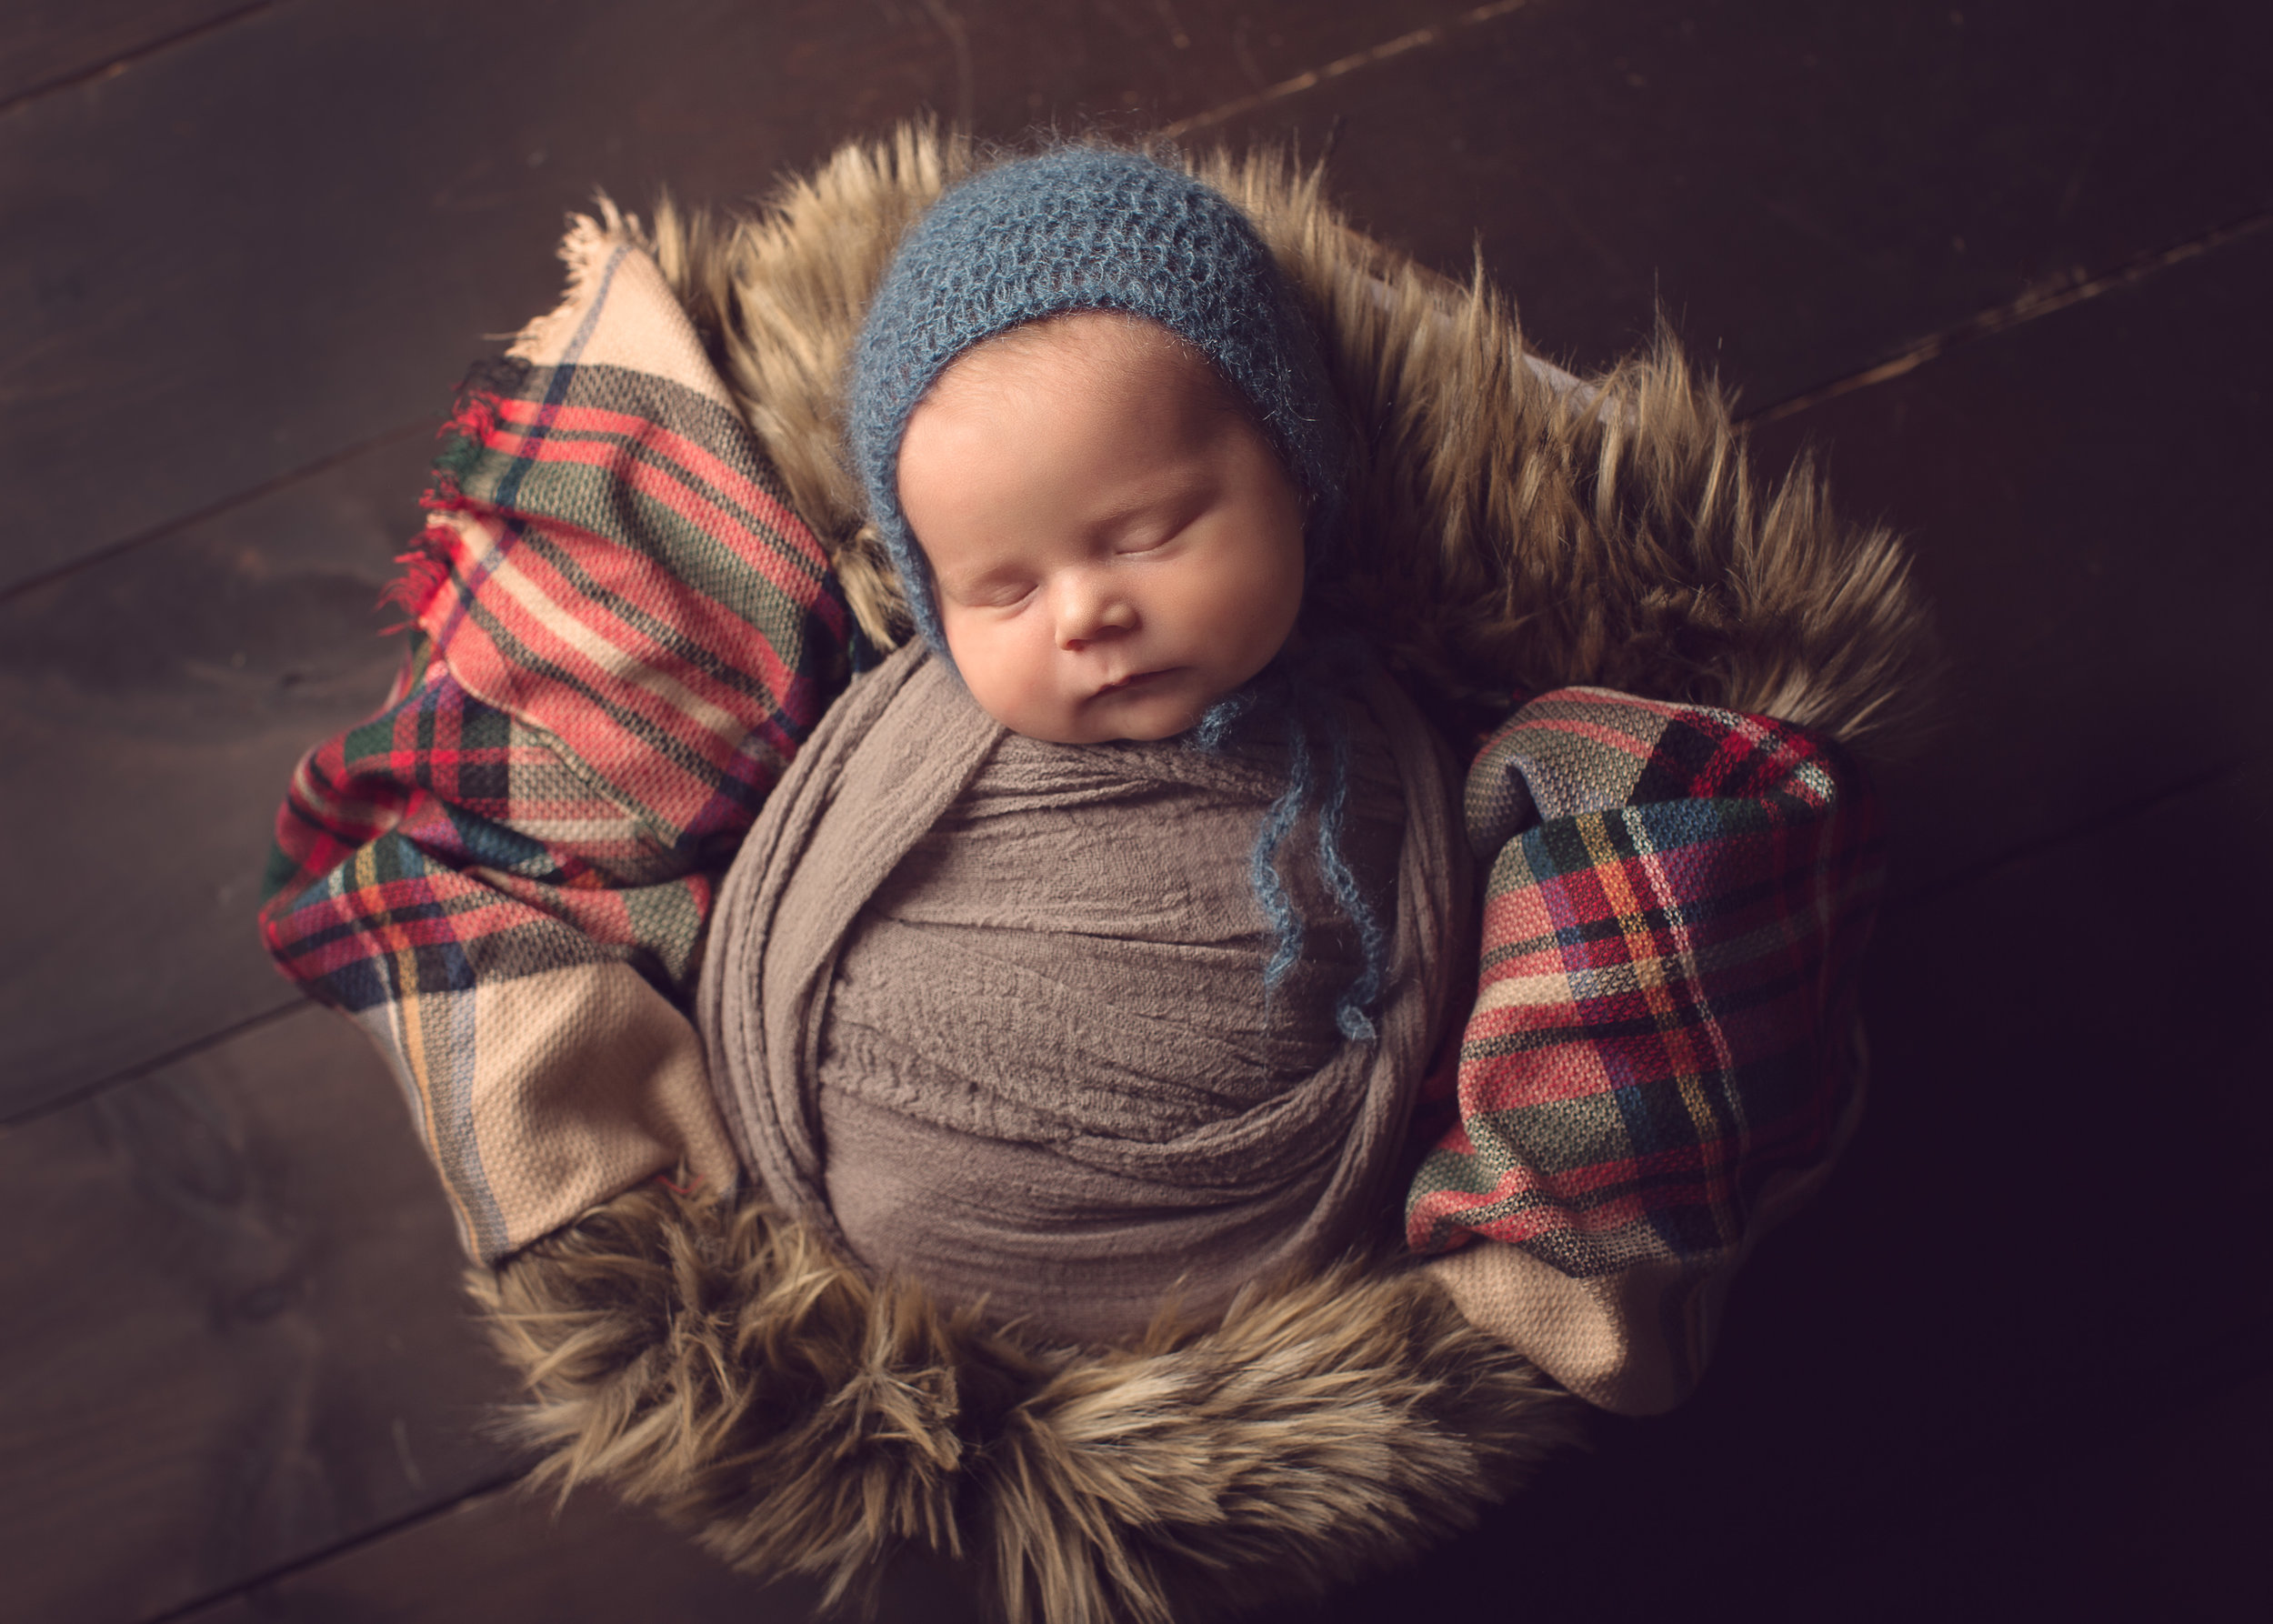 millbury_newborn_photographer_massachusetts_boston_baby_boy_photos.jpg